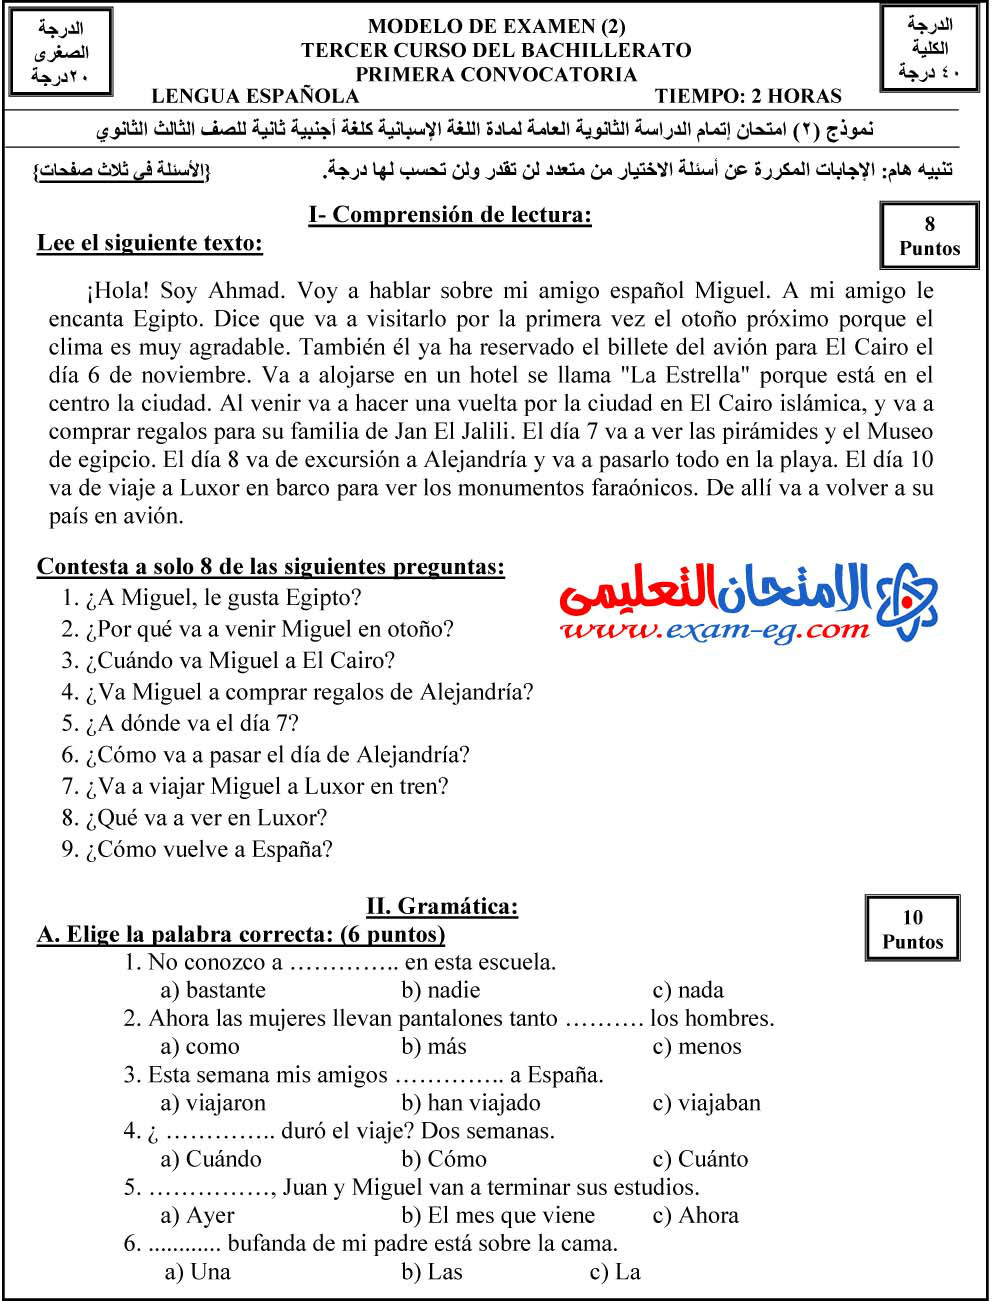 exam-eg.com_1396622191231.jpg